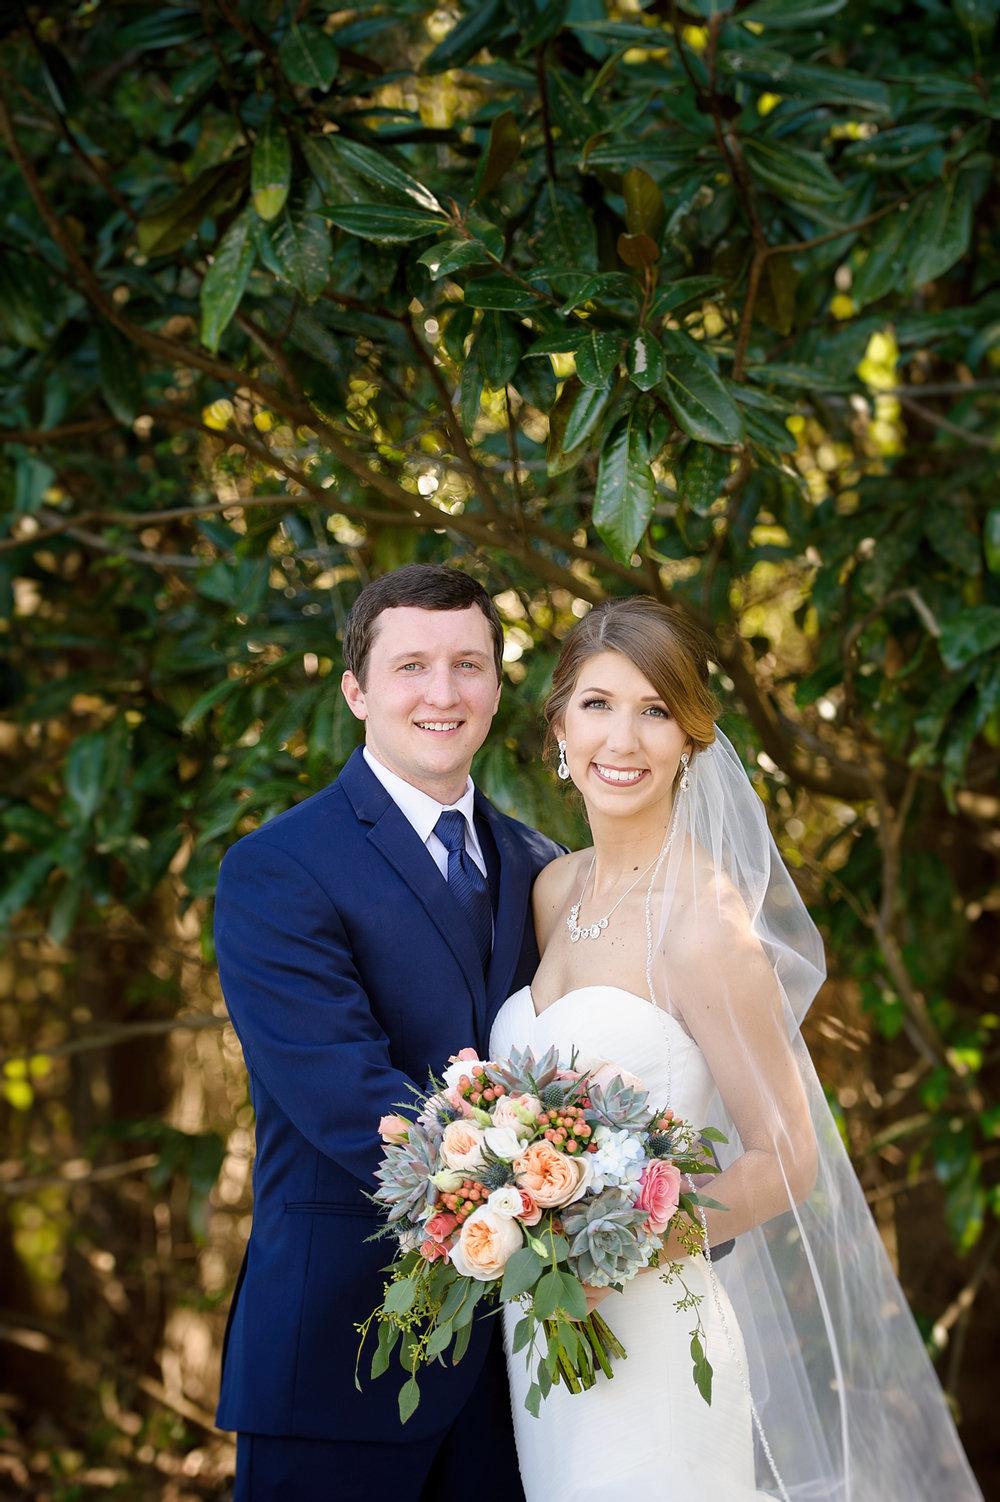 FIRST LOOK WEDDING PHOTOS-7.JPG